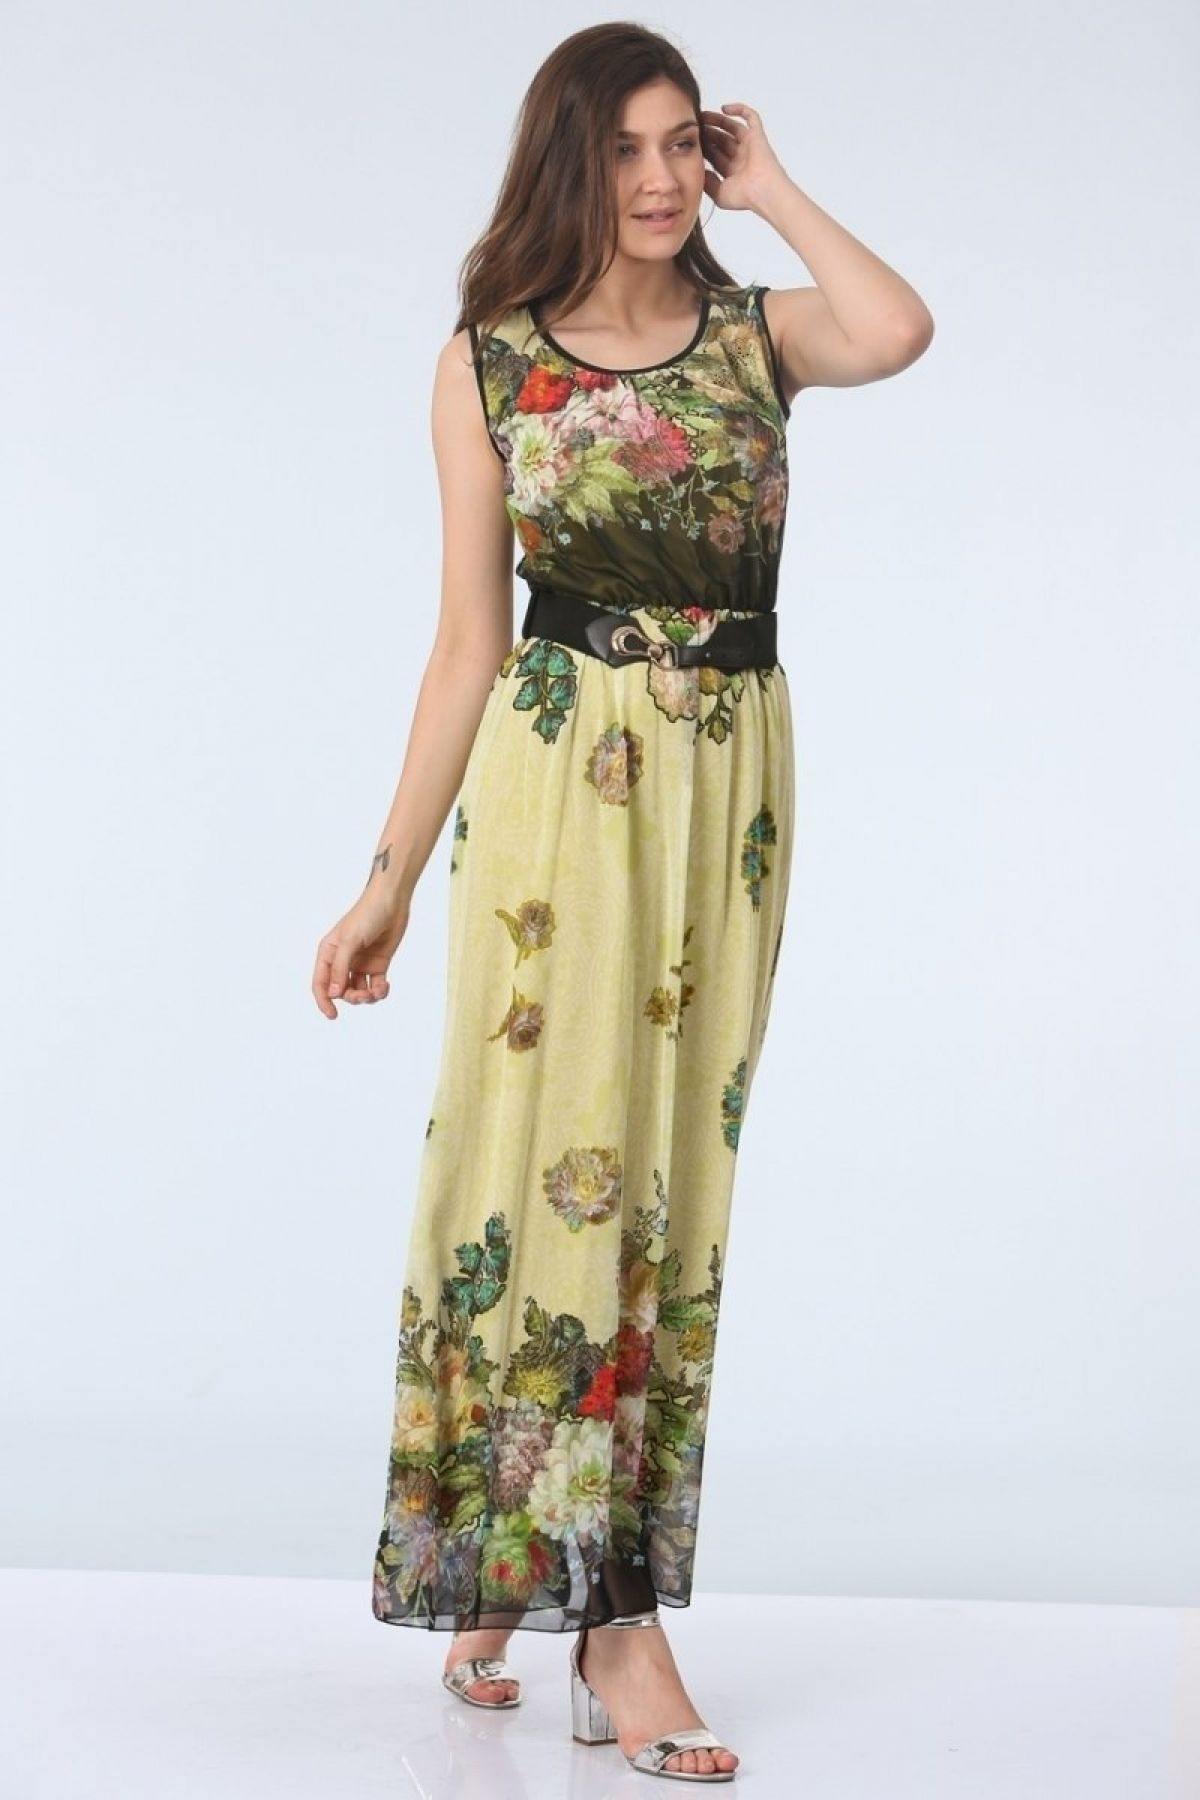 Day Dresses Long-olive-drab